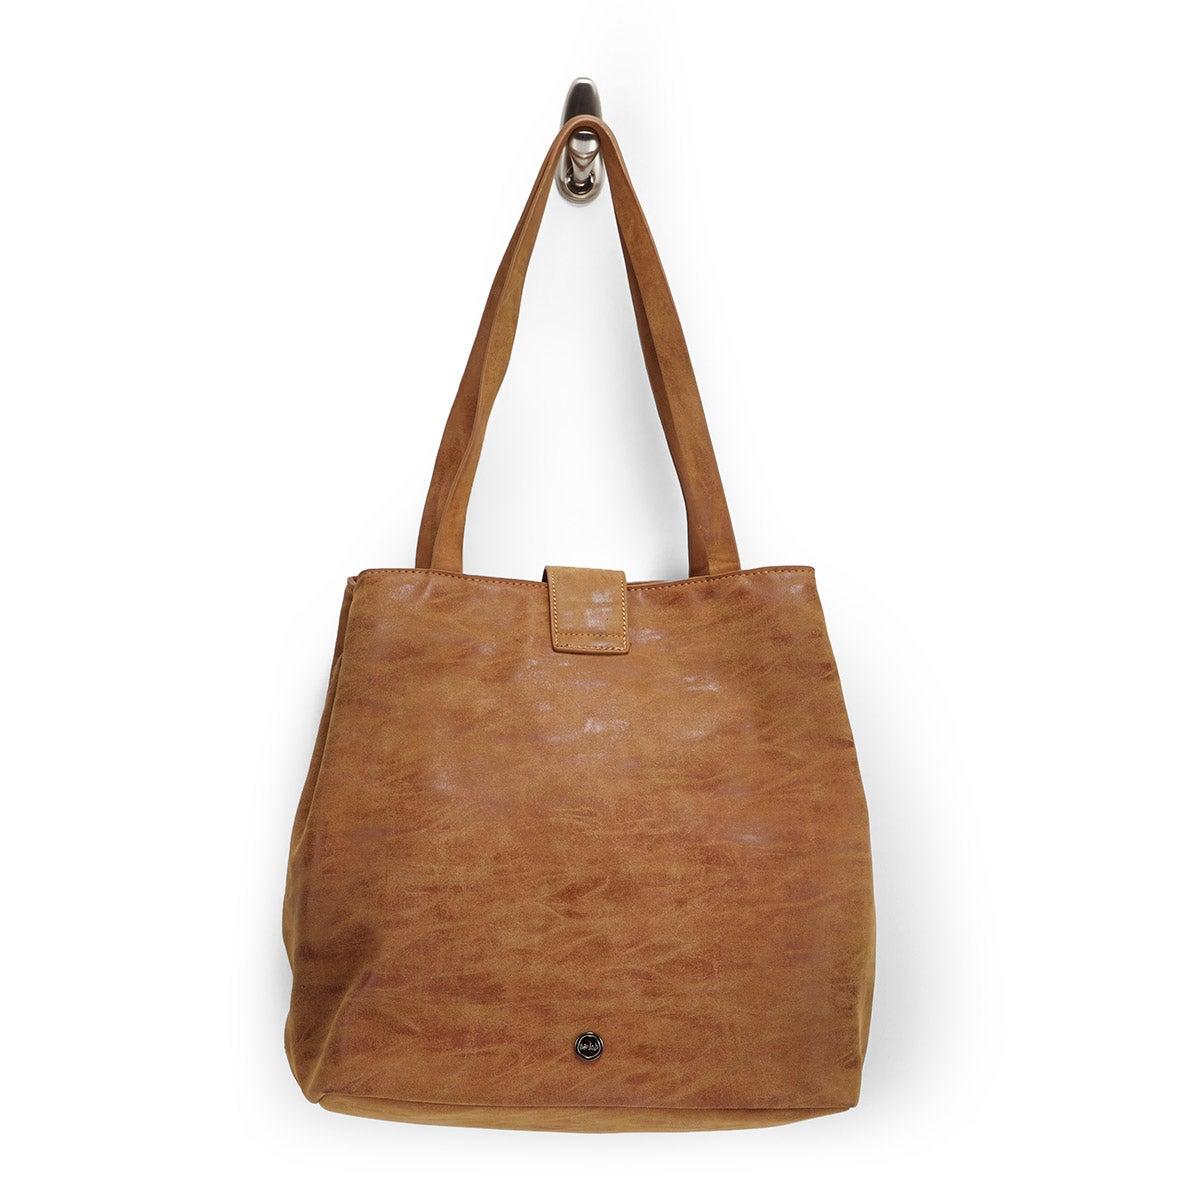 Lds camel buckle up tote bag